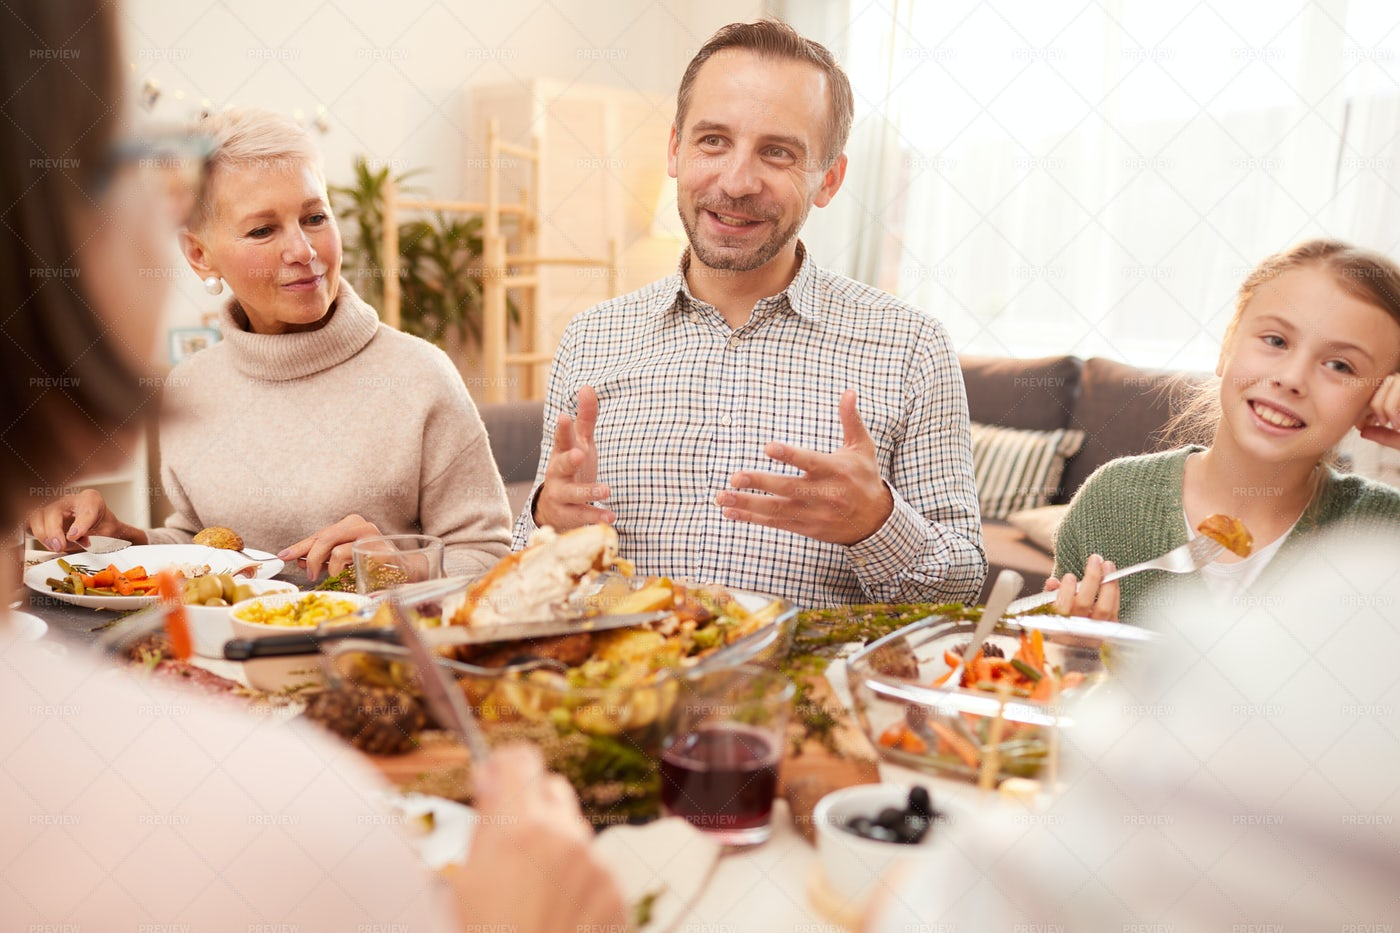 Joyful Family Having Dinner: Stock Photos